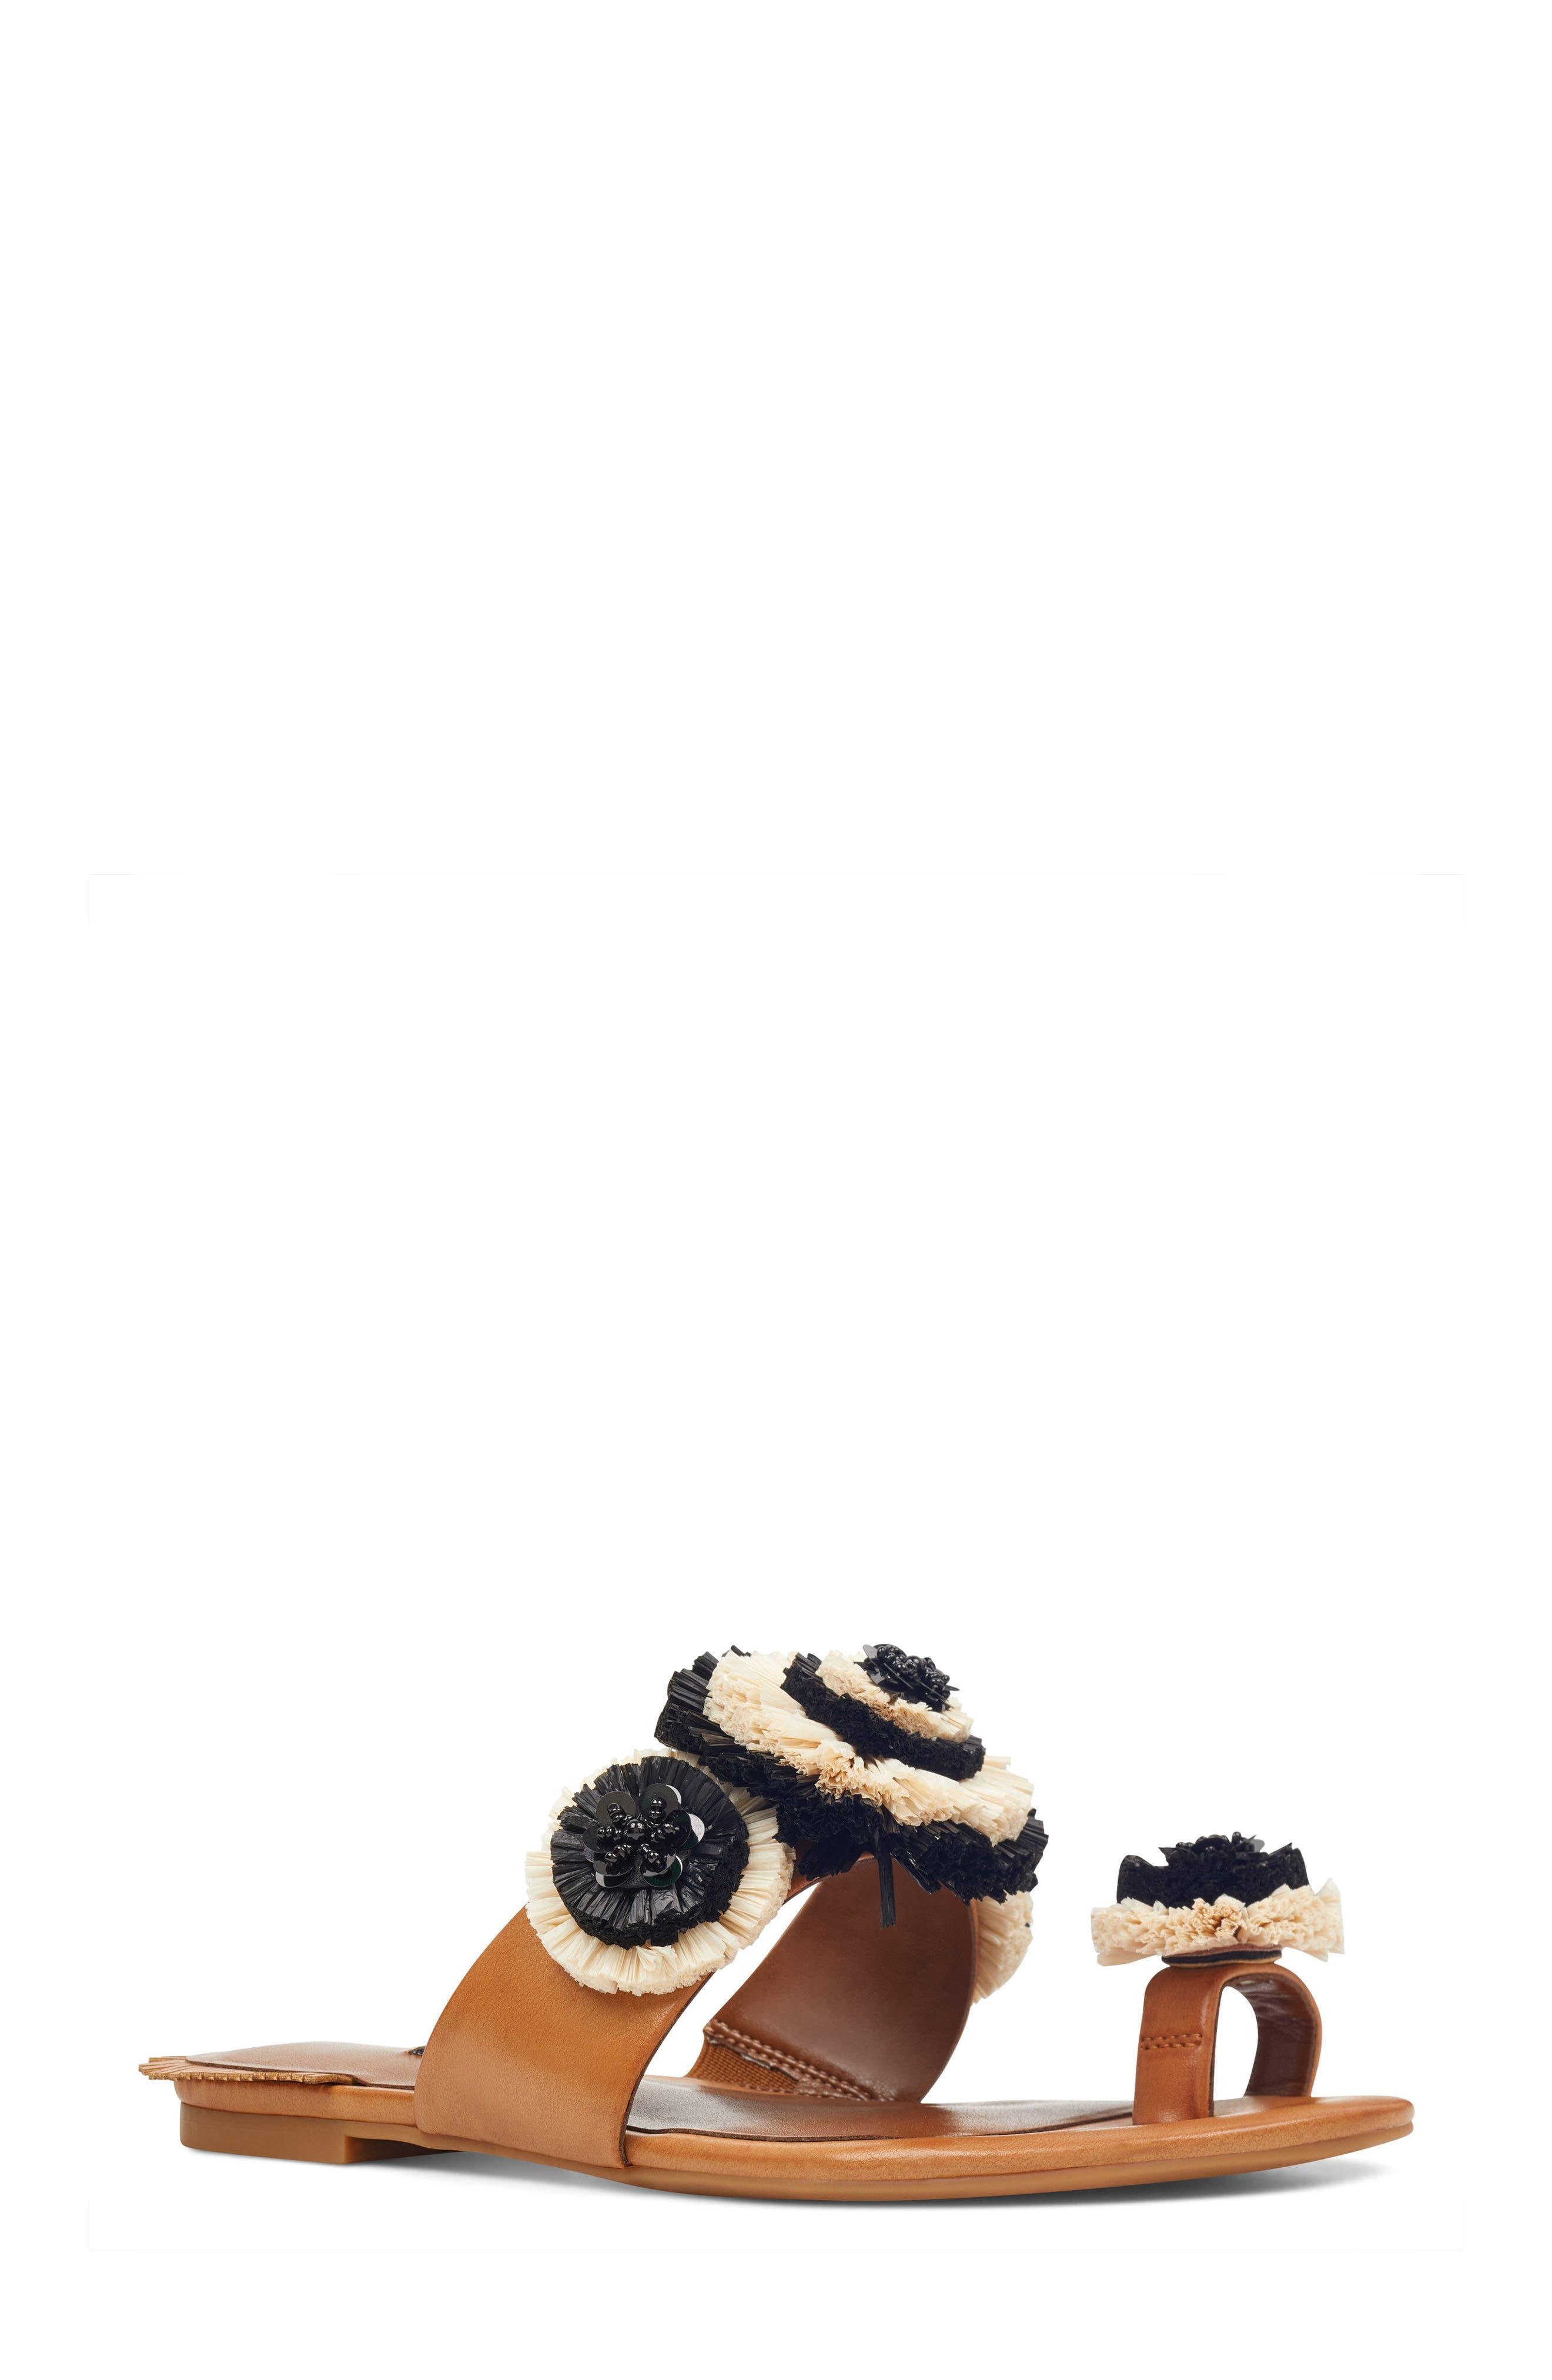 Sendran Raffia Flower Sandal,                         Main,                         color, Dark Natural Faux Leather